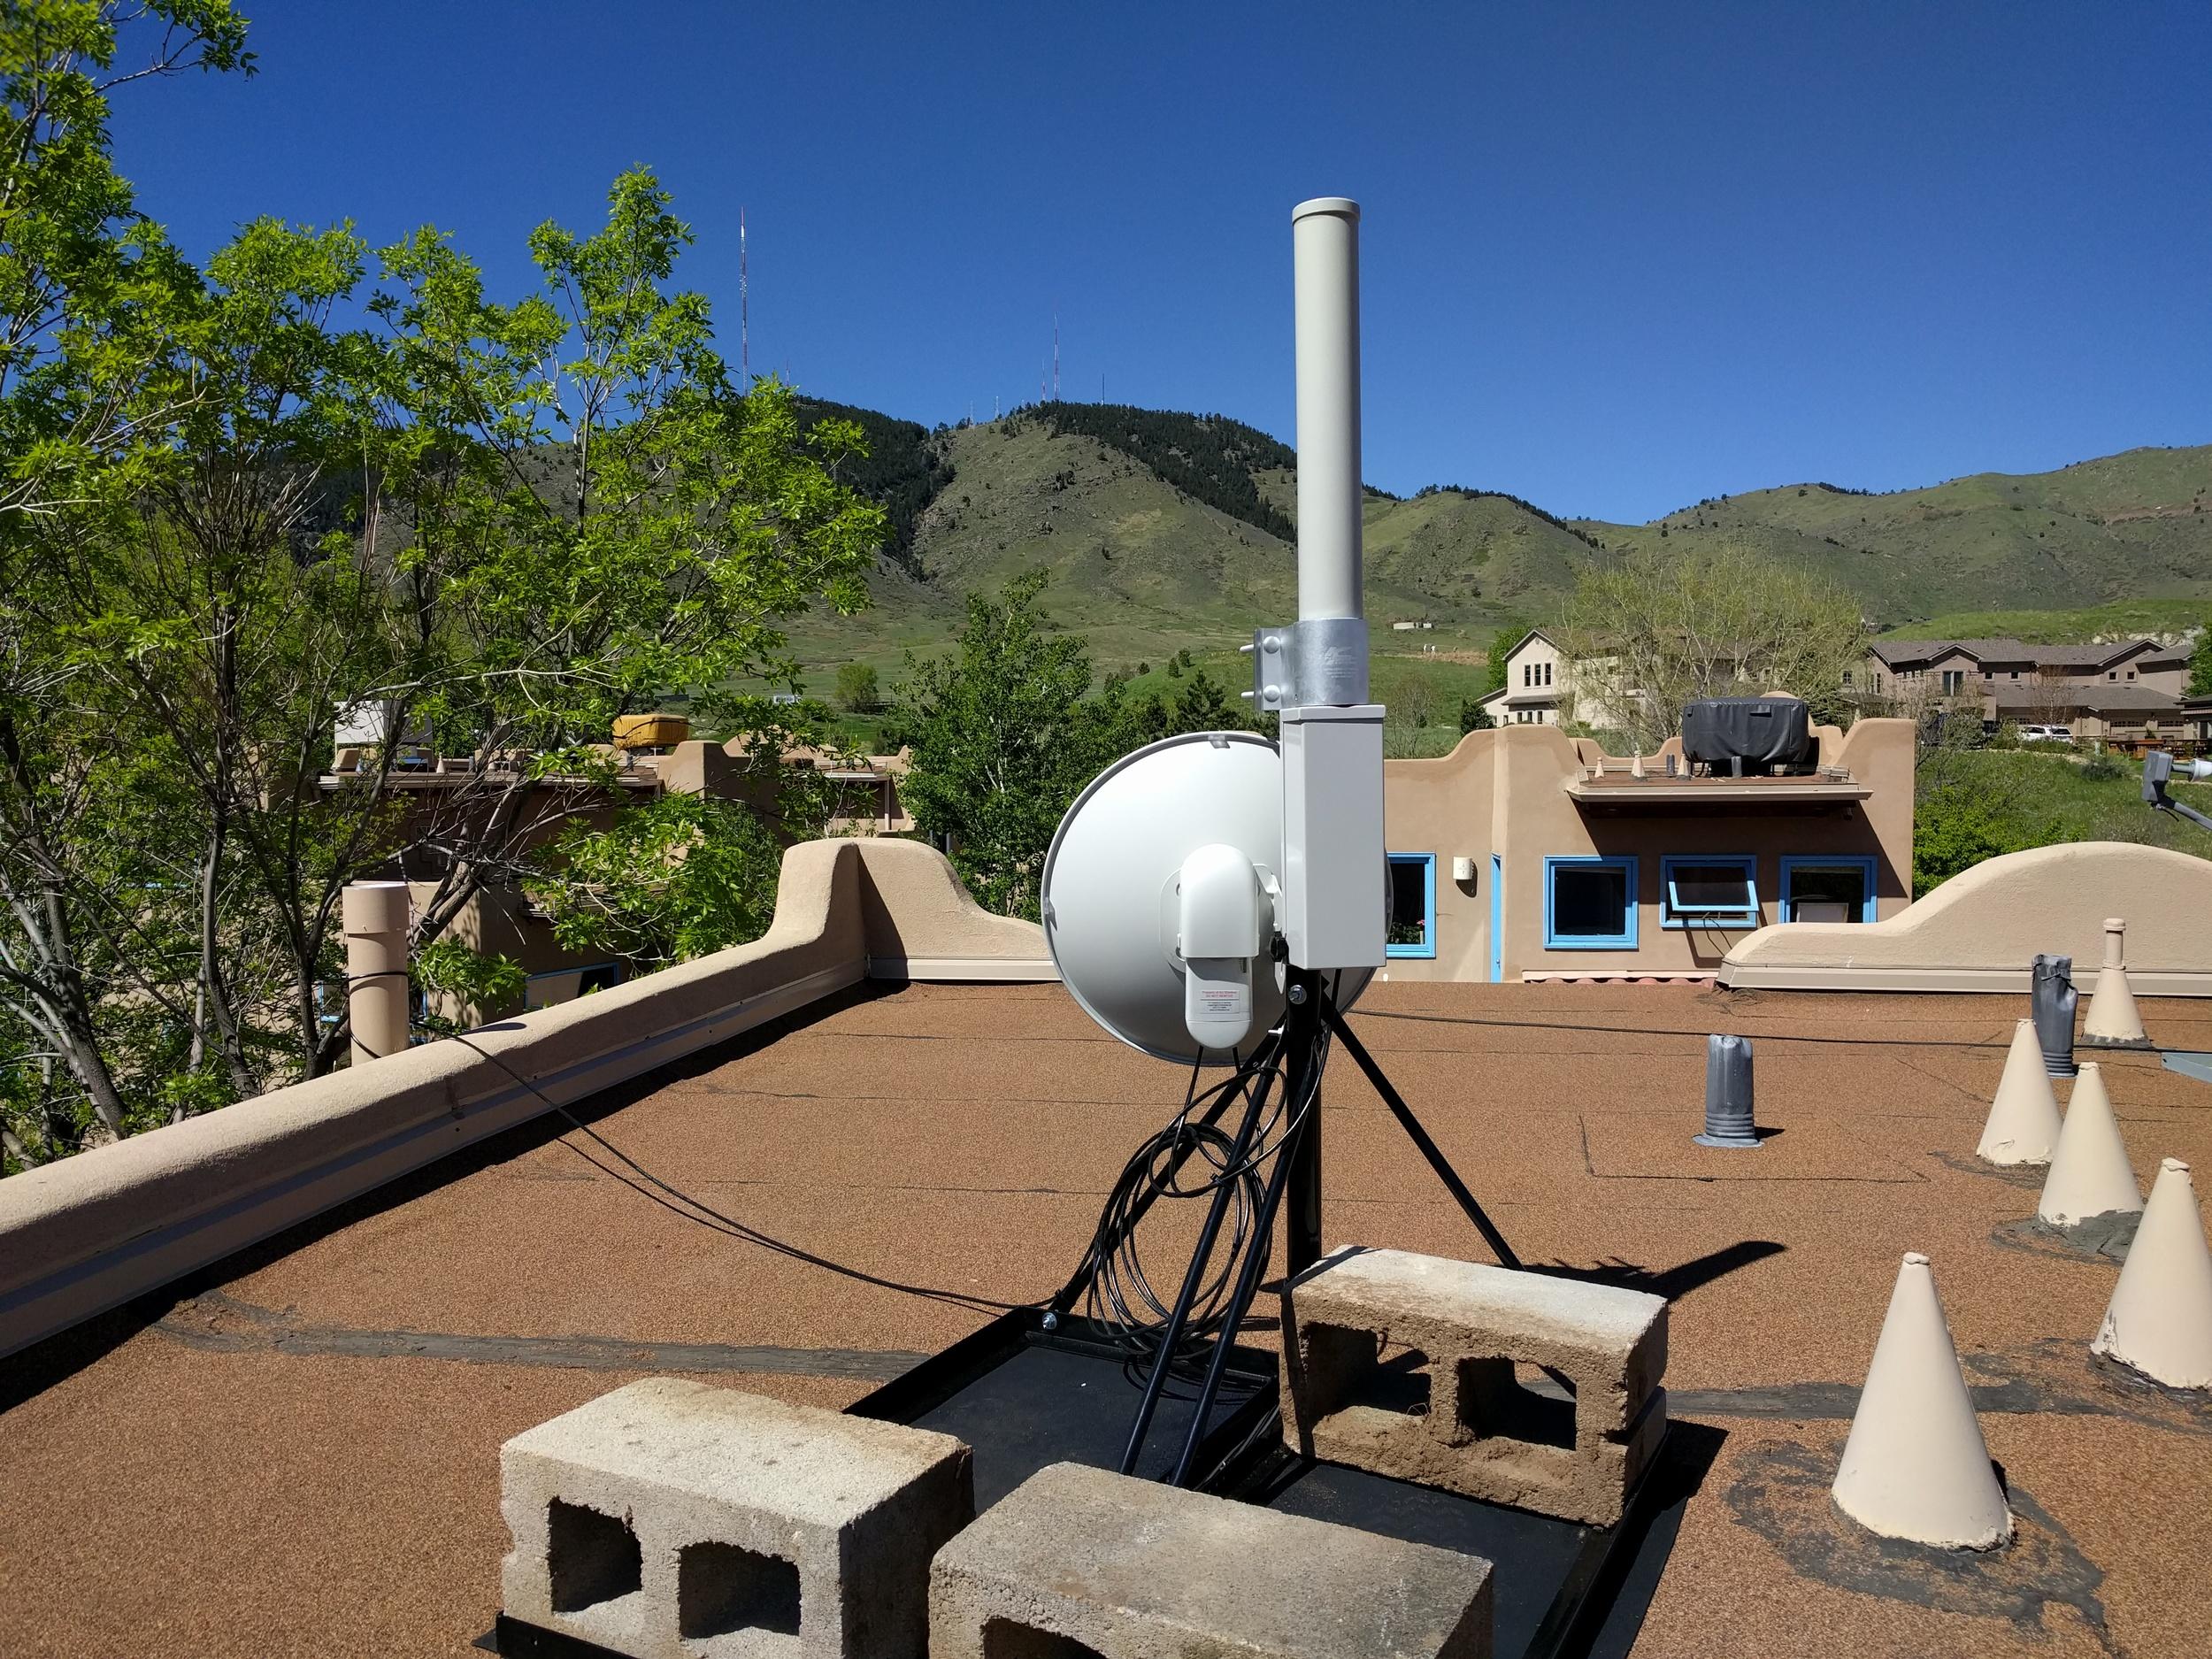 Transmitter in Harmony Village